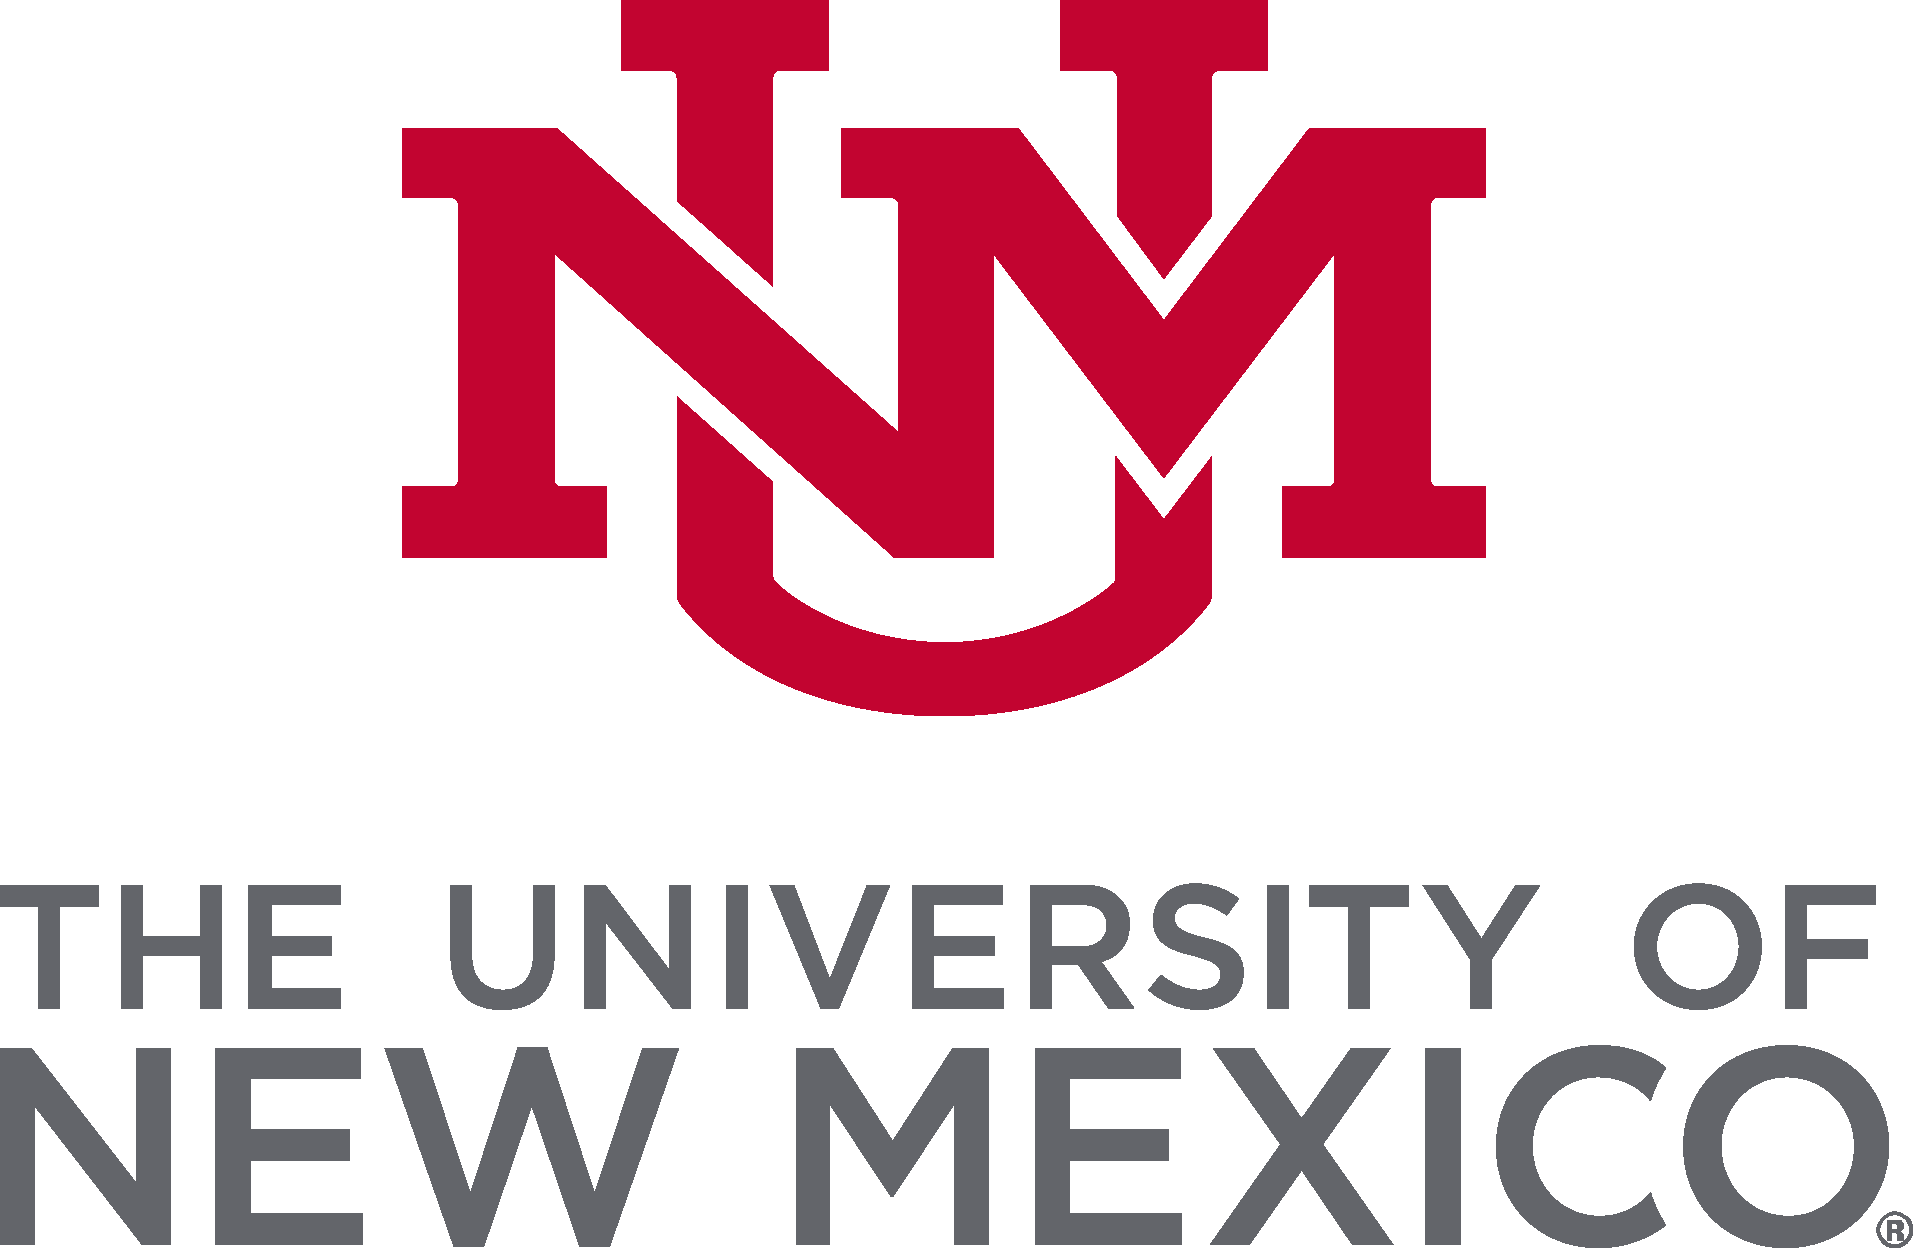 Resultado de imagen para university of new mexico logo